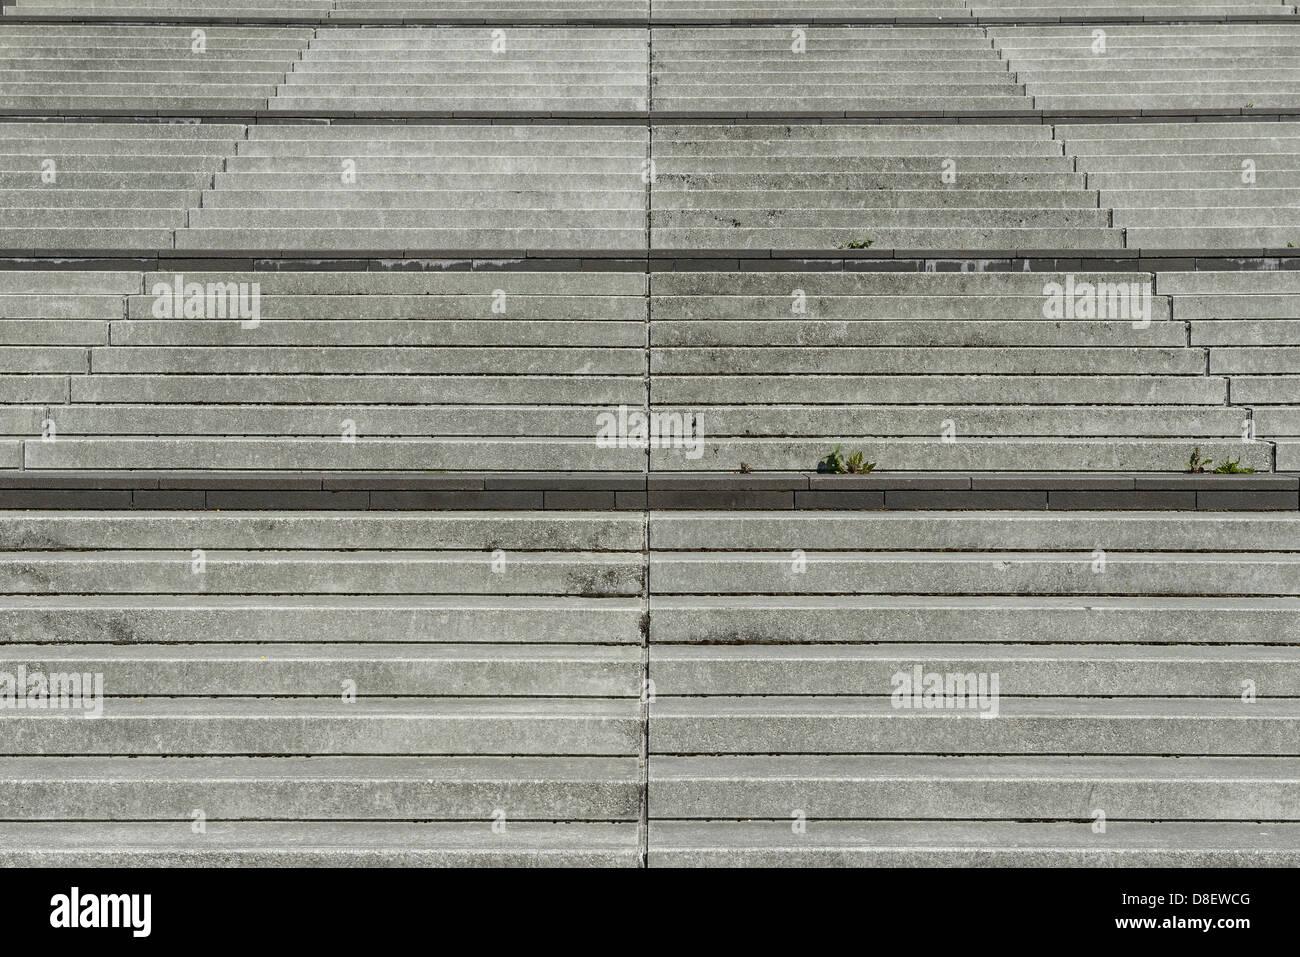 Concrete steps - Stock Image